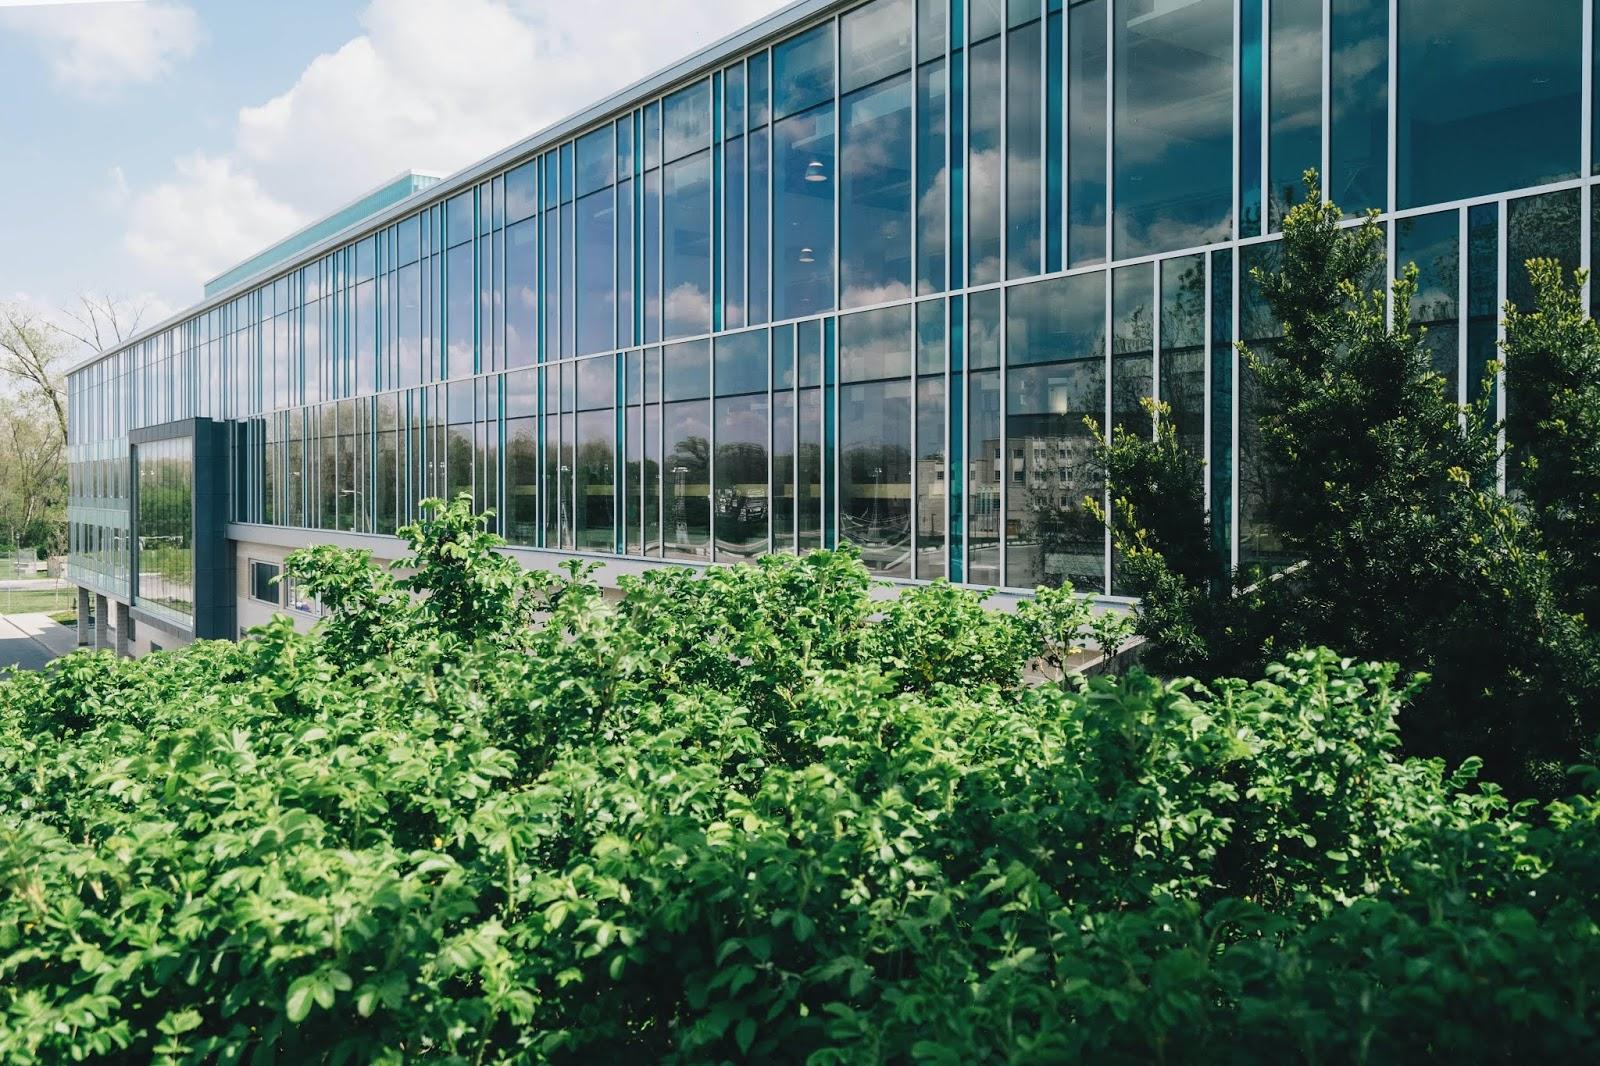 arquitectura bioclimatica ejemplos